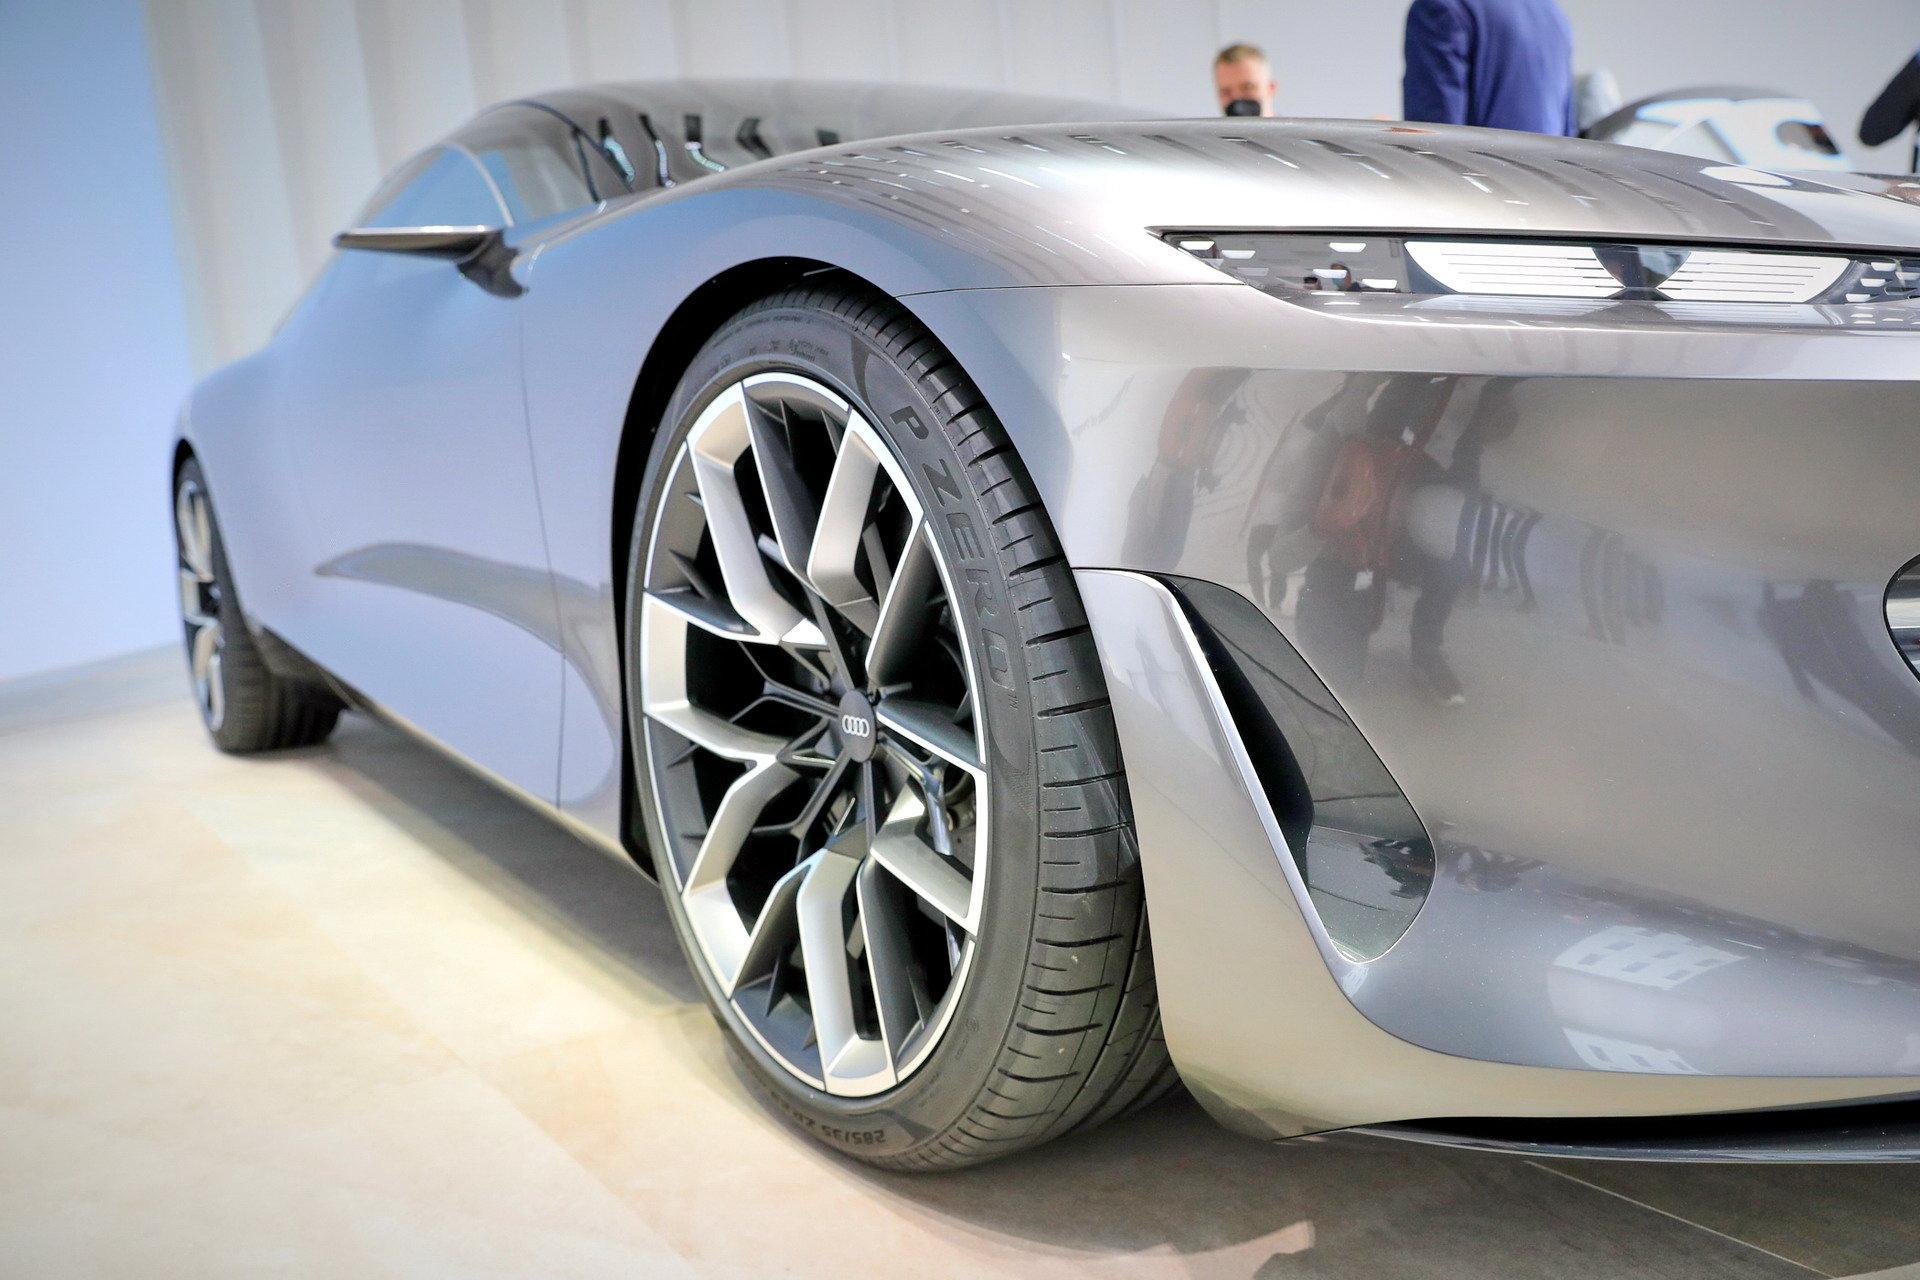 Audi-GrandSphere-Concept-A8-32.jpg